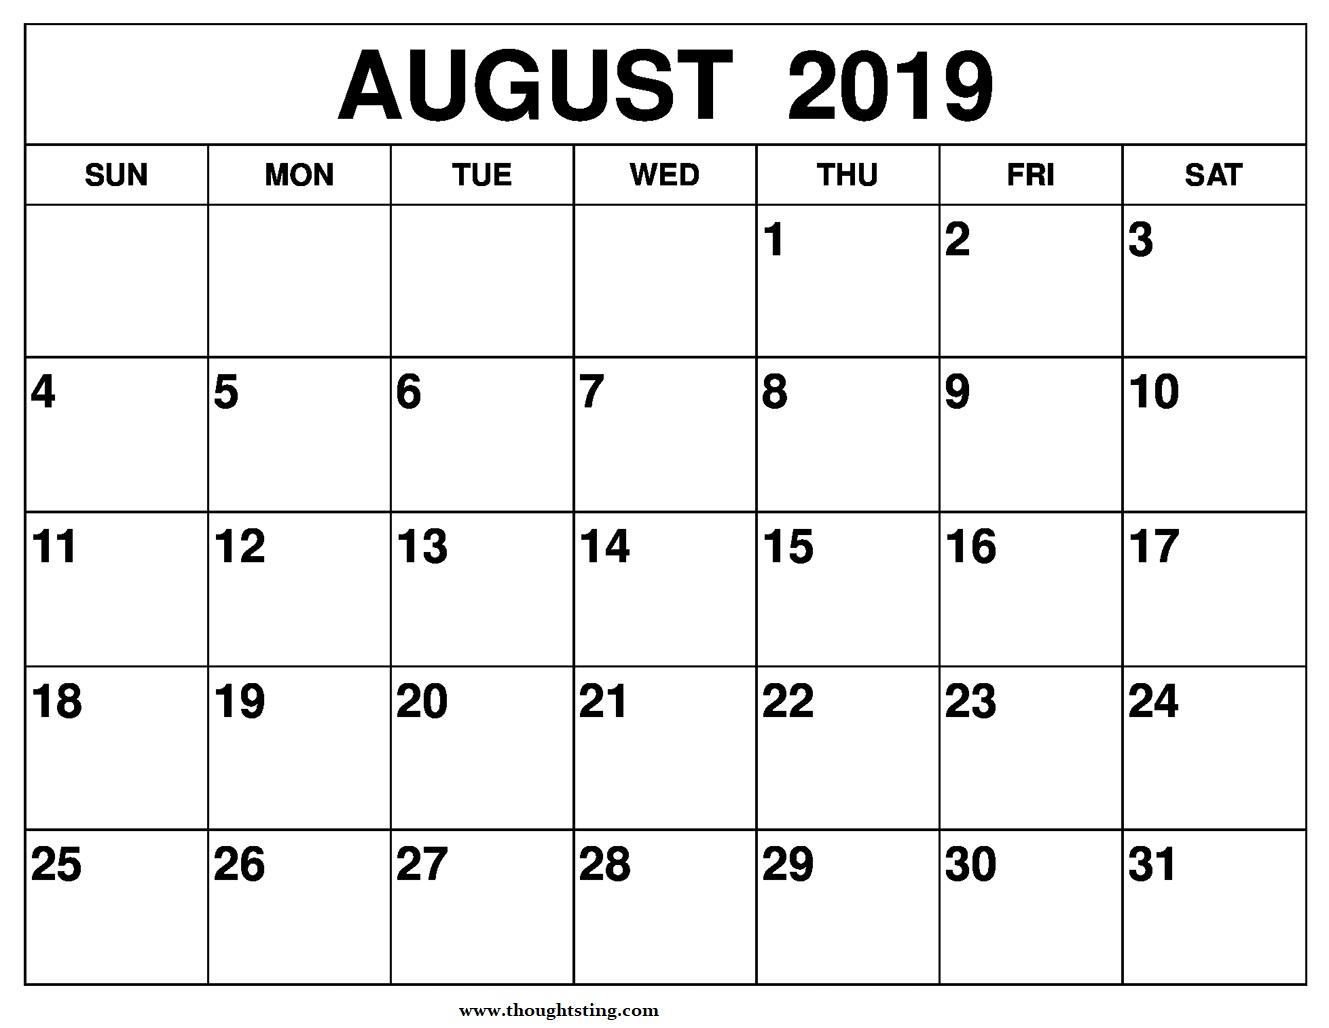 August 2019 Calendar Printable A4 Size - Free Printable Calendar in Blank Calendars For August